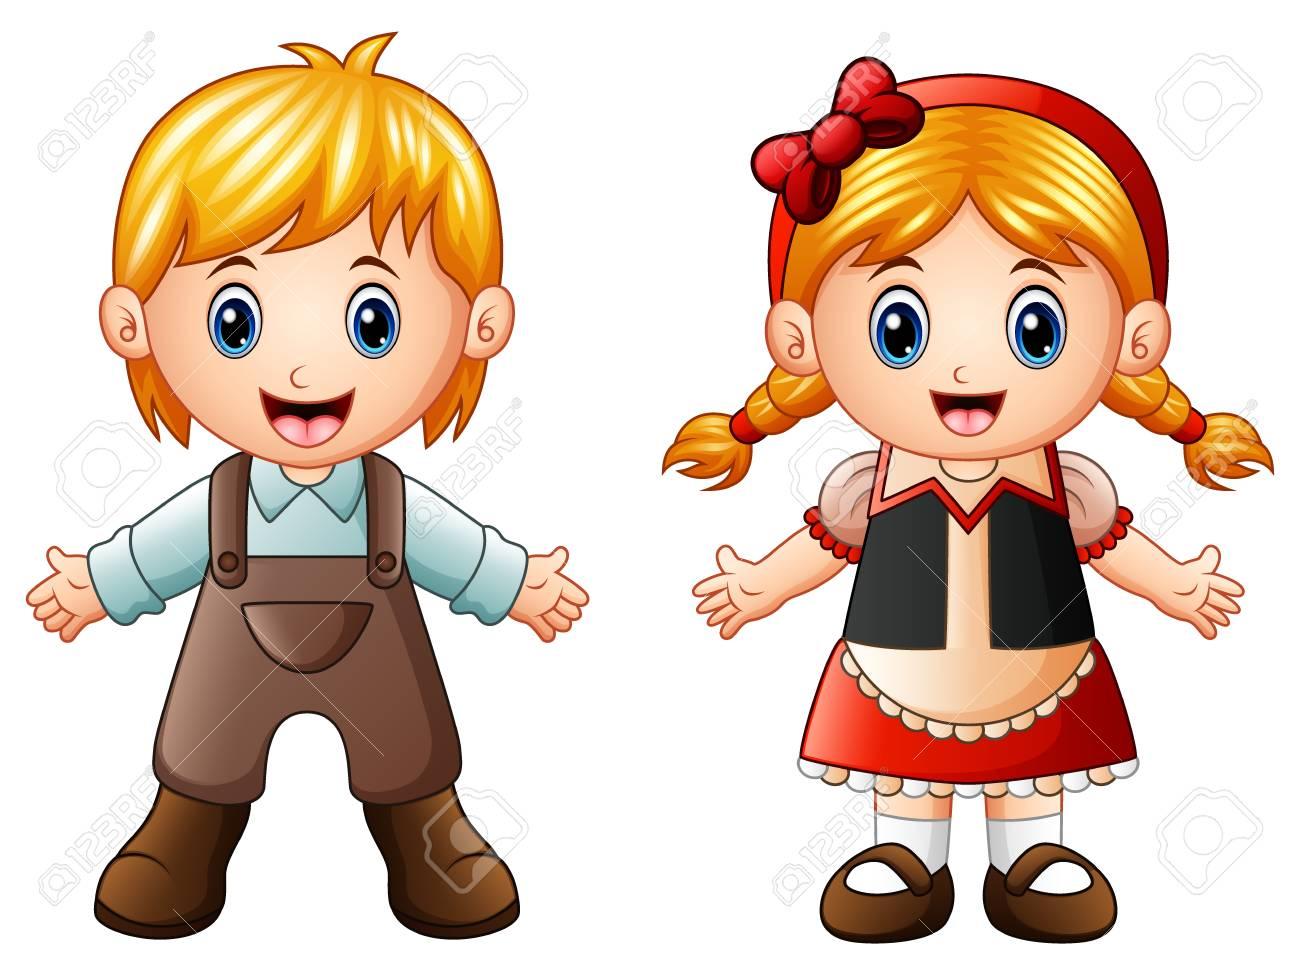 Vector Illustration Of Children Story Hansel And Gretel Royalty 1300x975